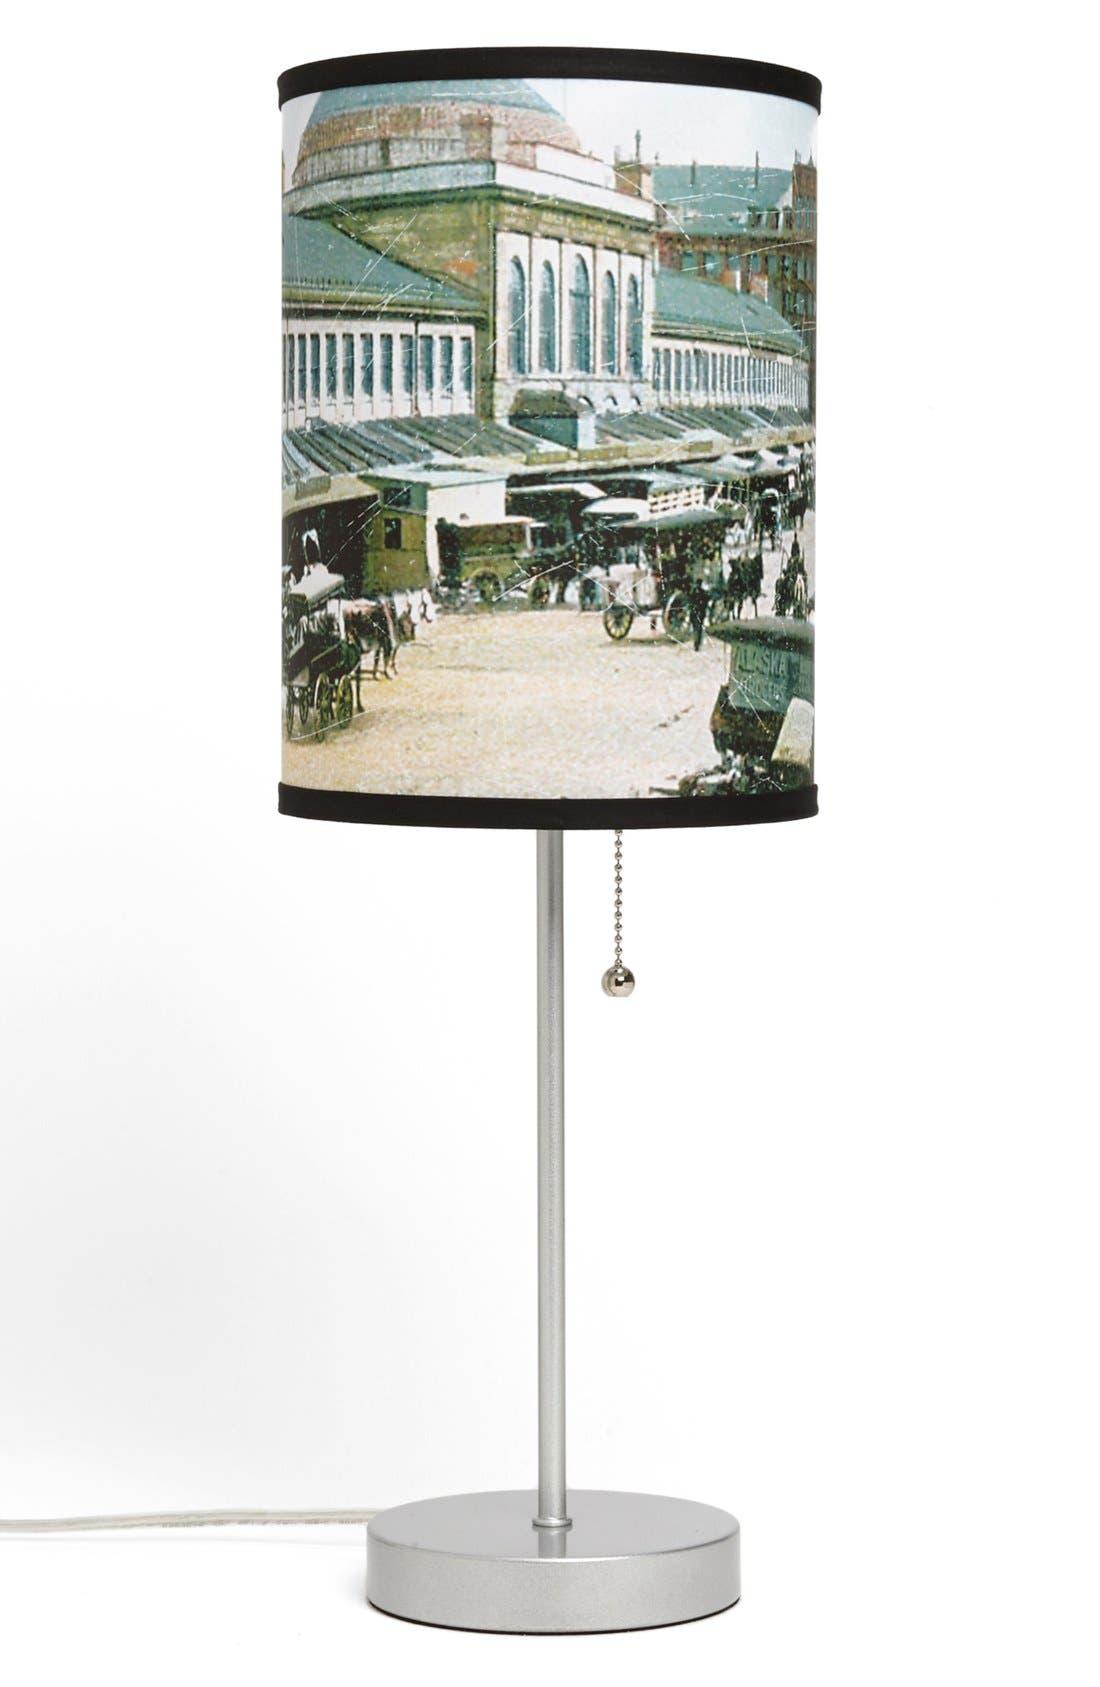 Main Image - LAMP-IN-A-BOX 'Boston Market District' Postcard Print Lamp